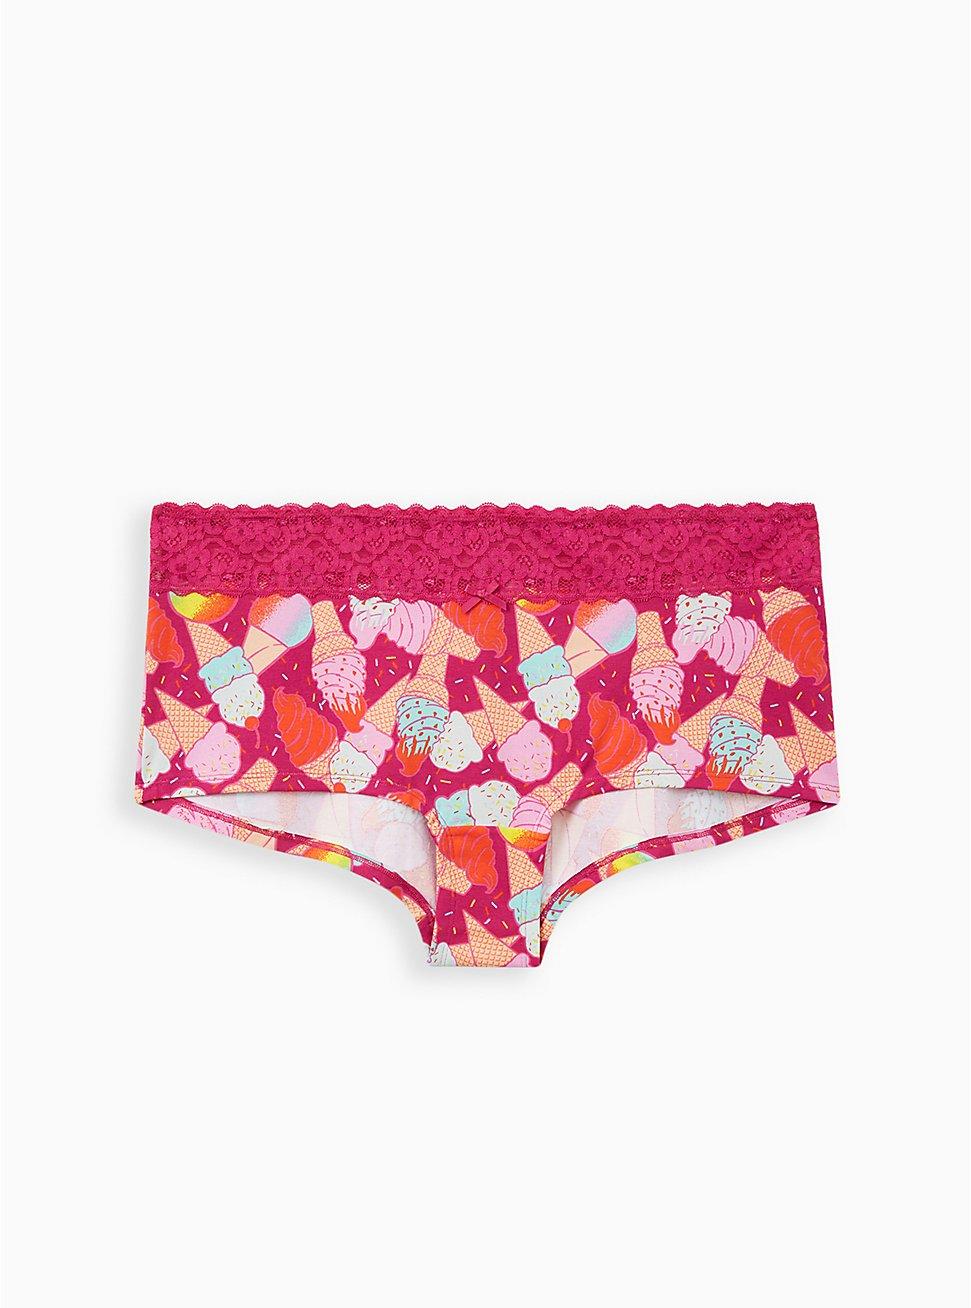 Pink Ice Cream Wide Lace Cotton Boyshort Panty, Ice Cream Party- PURPLE, hi-res